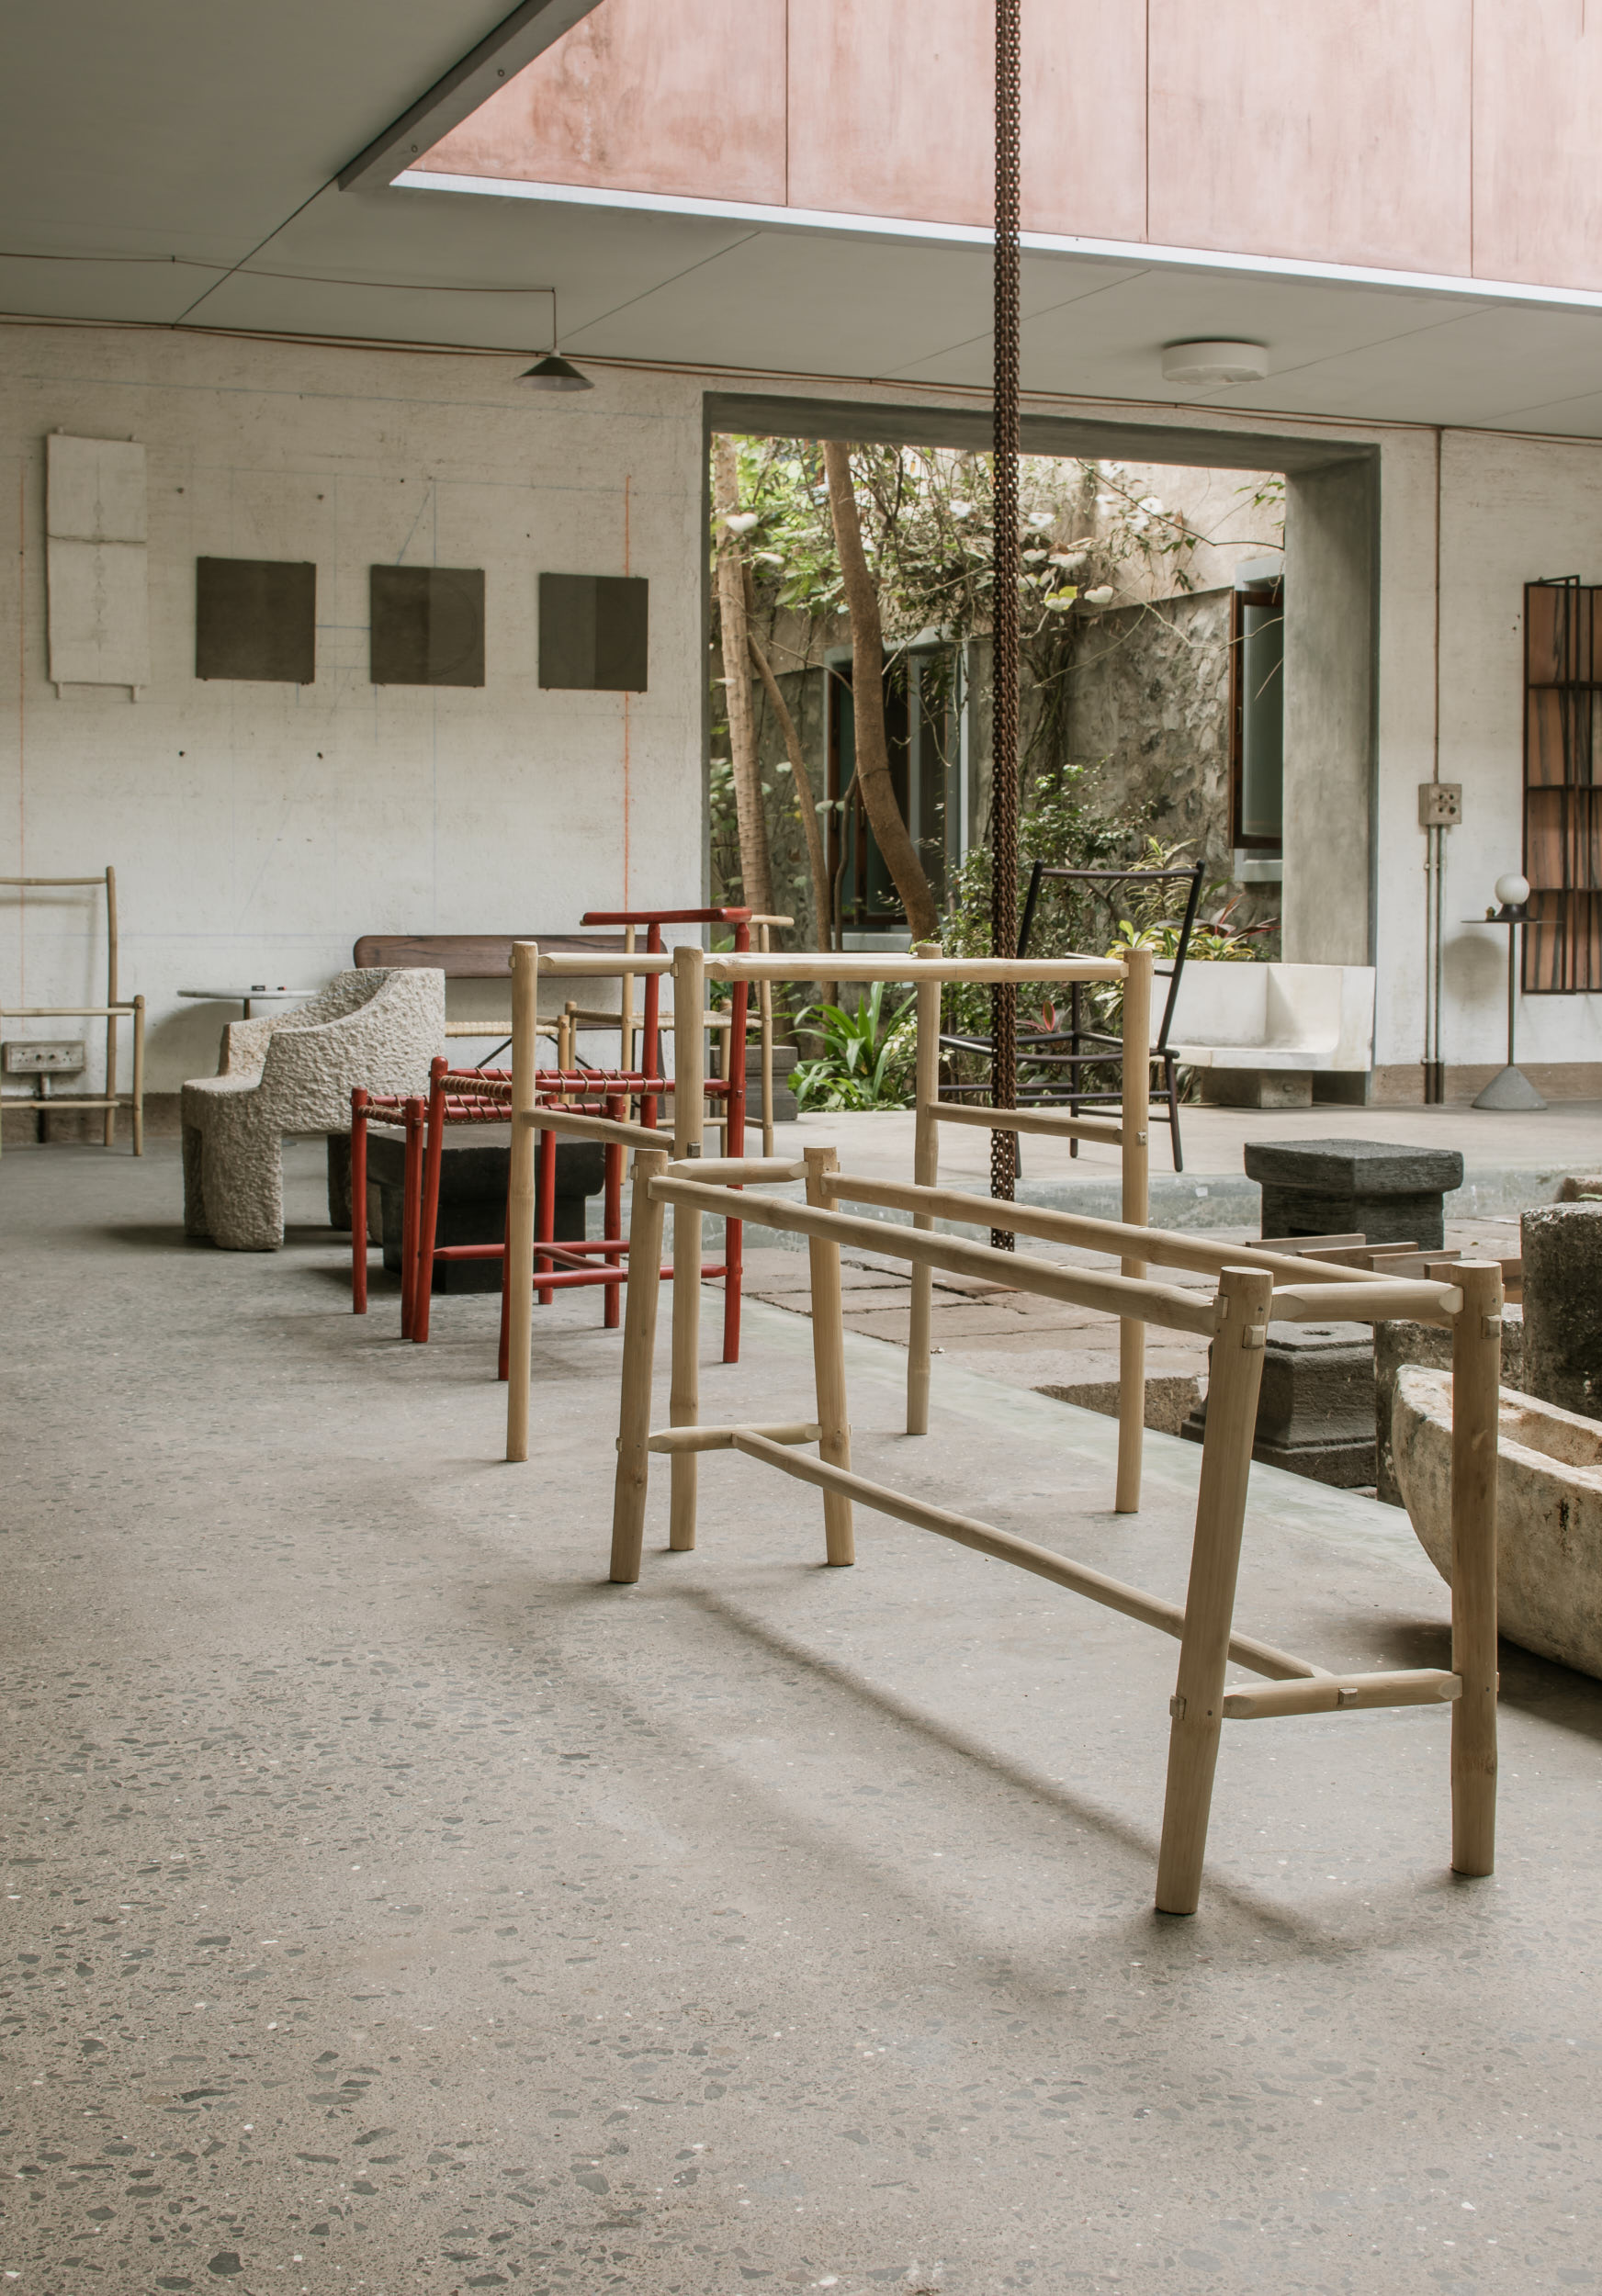 004. Bijoy Jain : Studio Mumbai for MANIERA. Photo Ⓒ Jeroen Verrecht.jpg